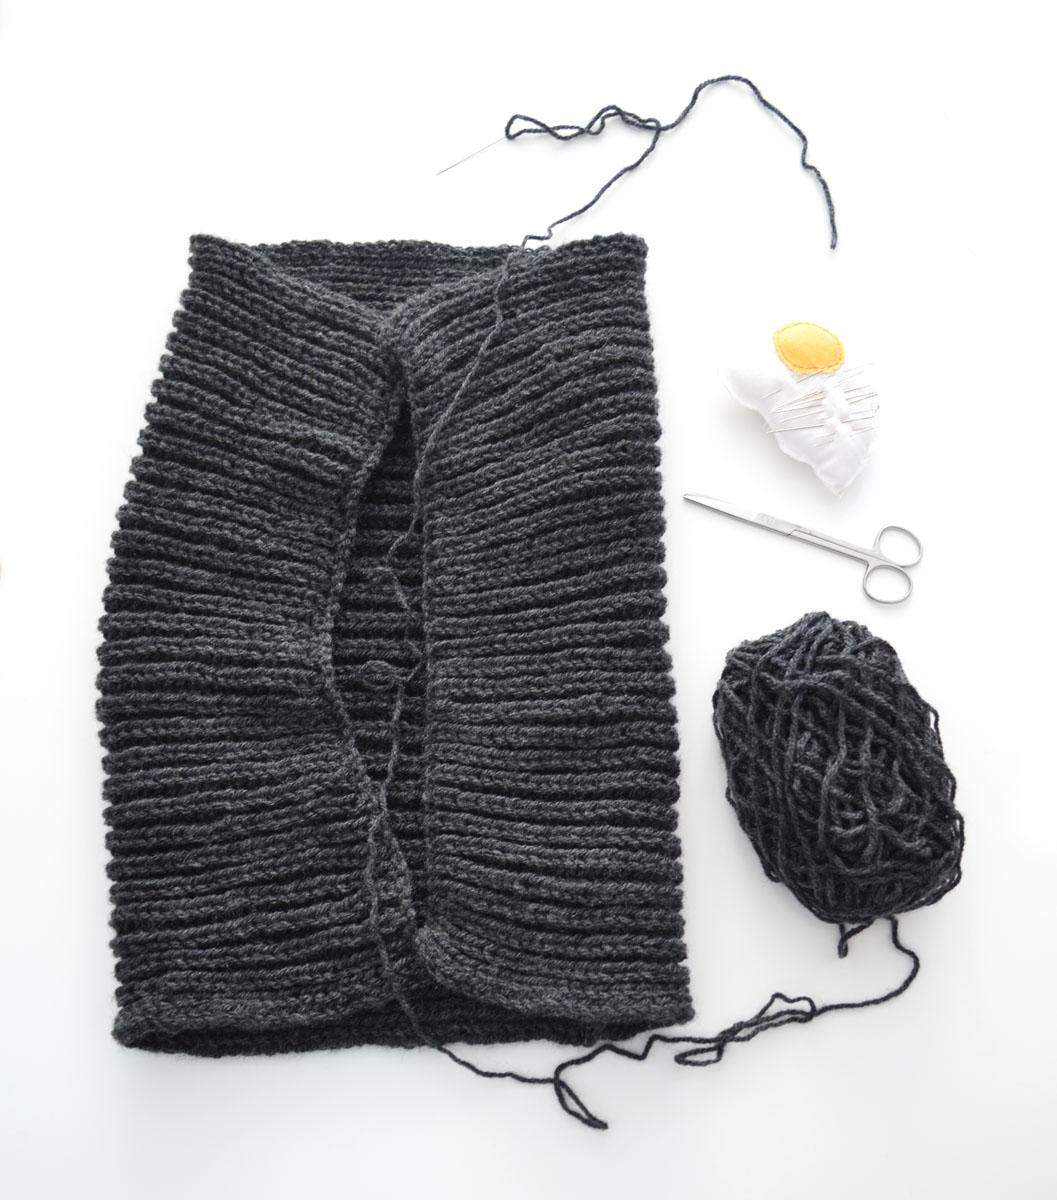 Cuello de lana gris de punto ingles departamento de ideas - Puntos de lana ...